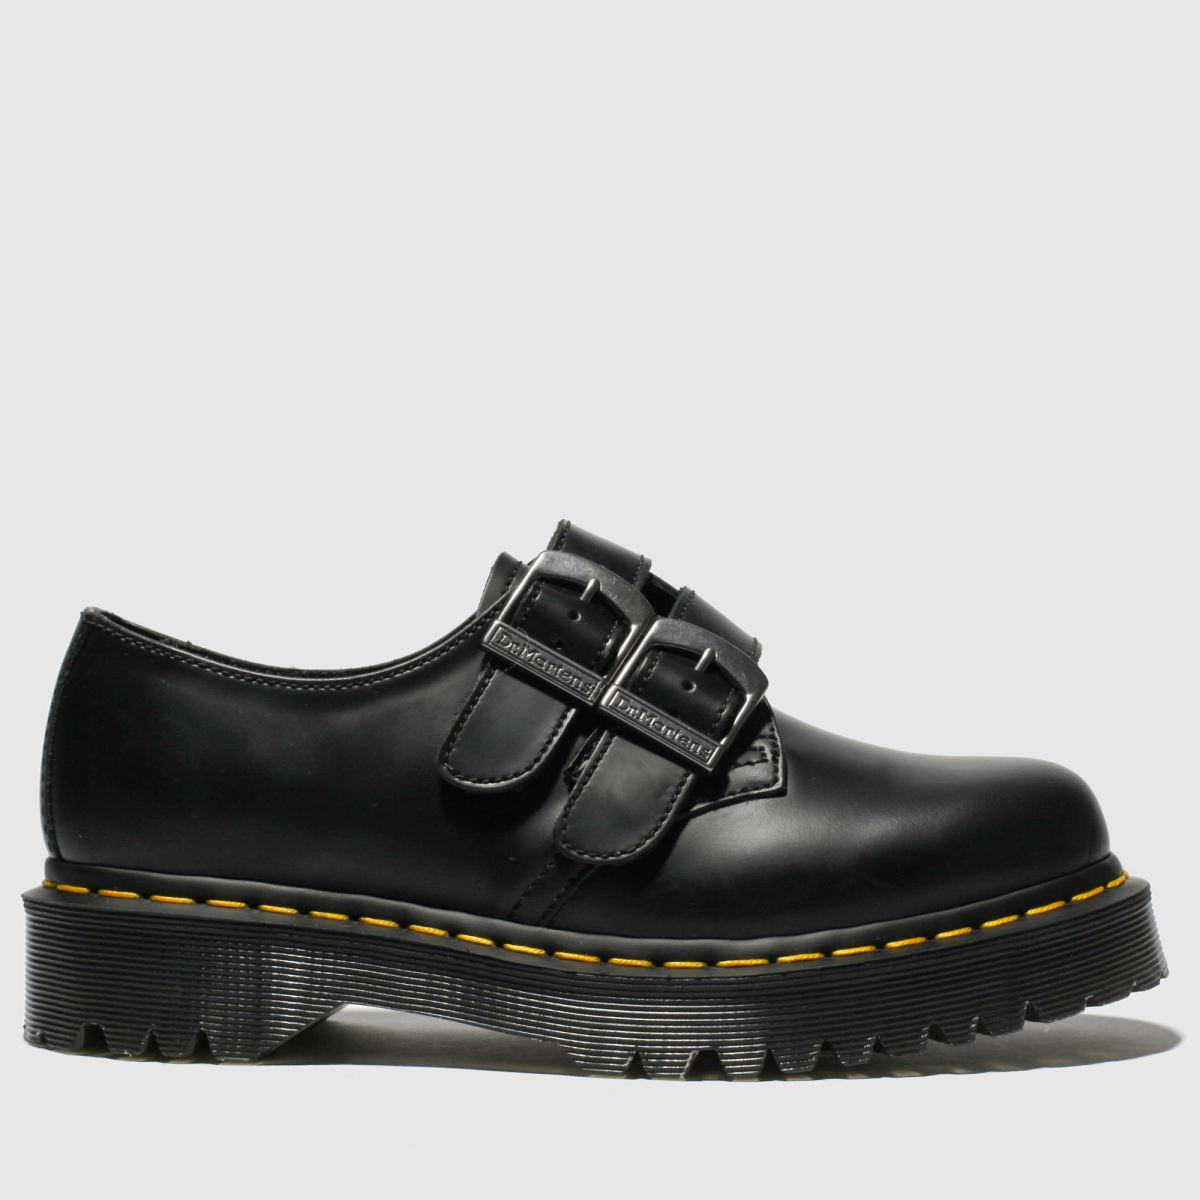 Dr Martens Black 1461 Alternative Flat Shoes